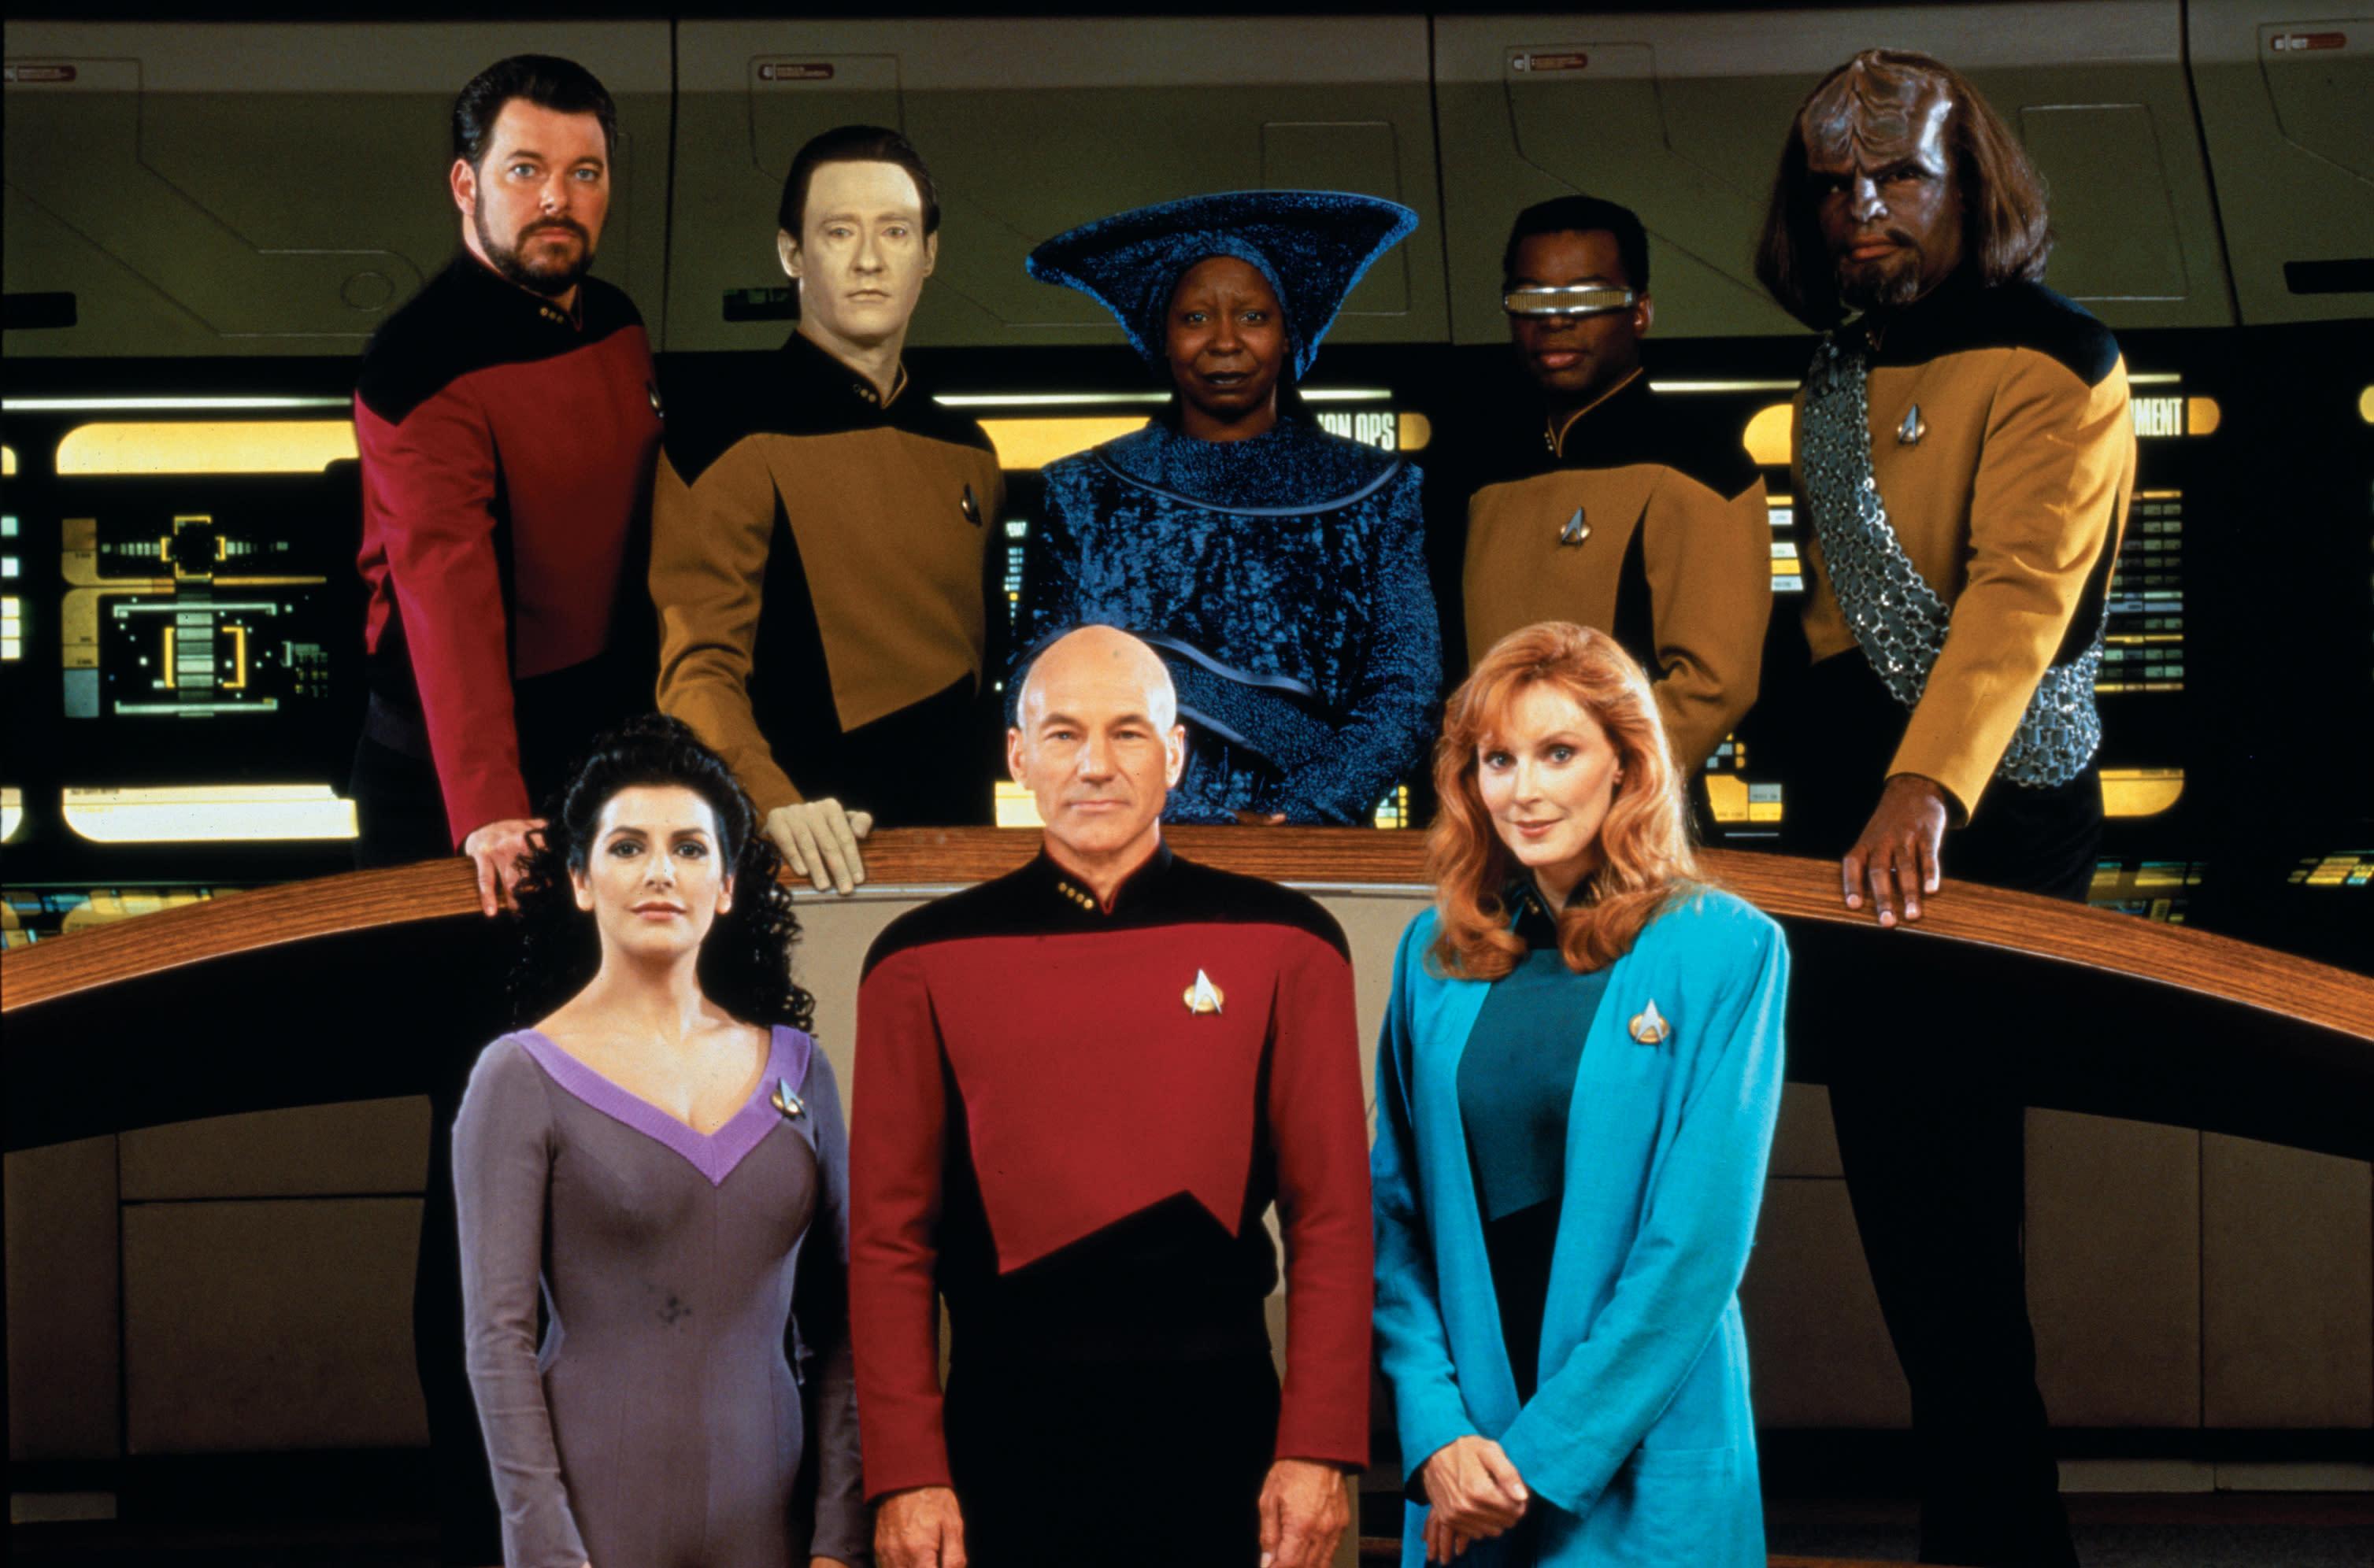 Whoopi Goldberg gets emotional as Patrick Stewart invites her back to 'Star Trek'